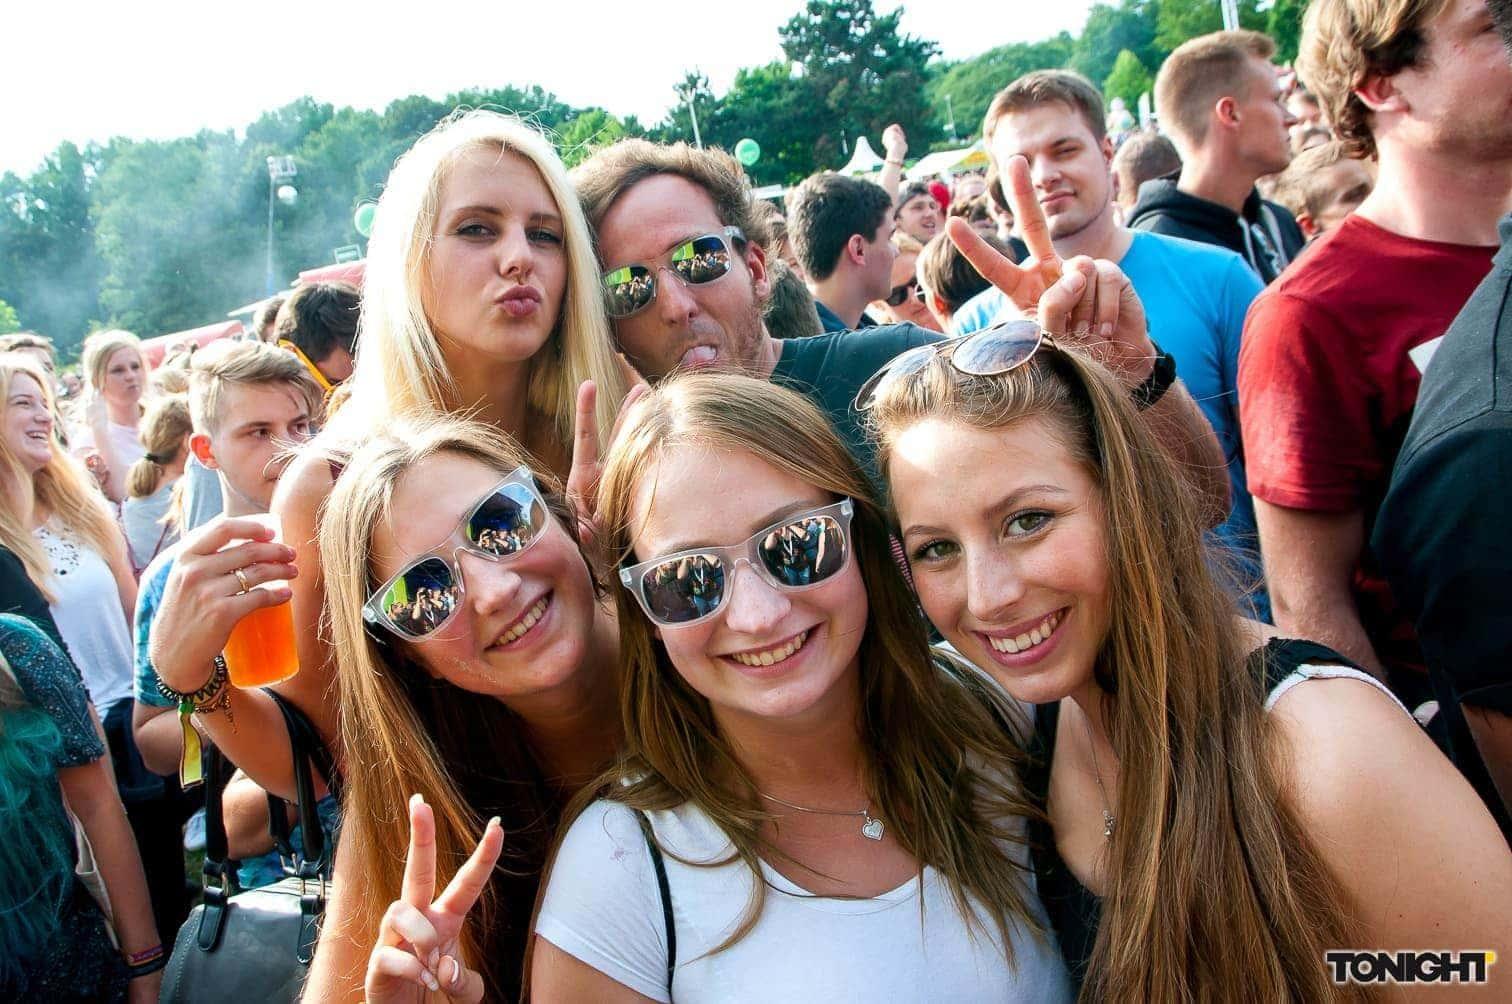 Juicy Beats Festival